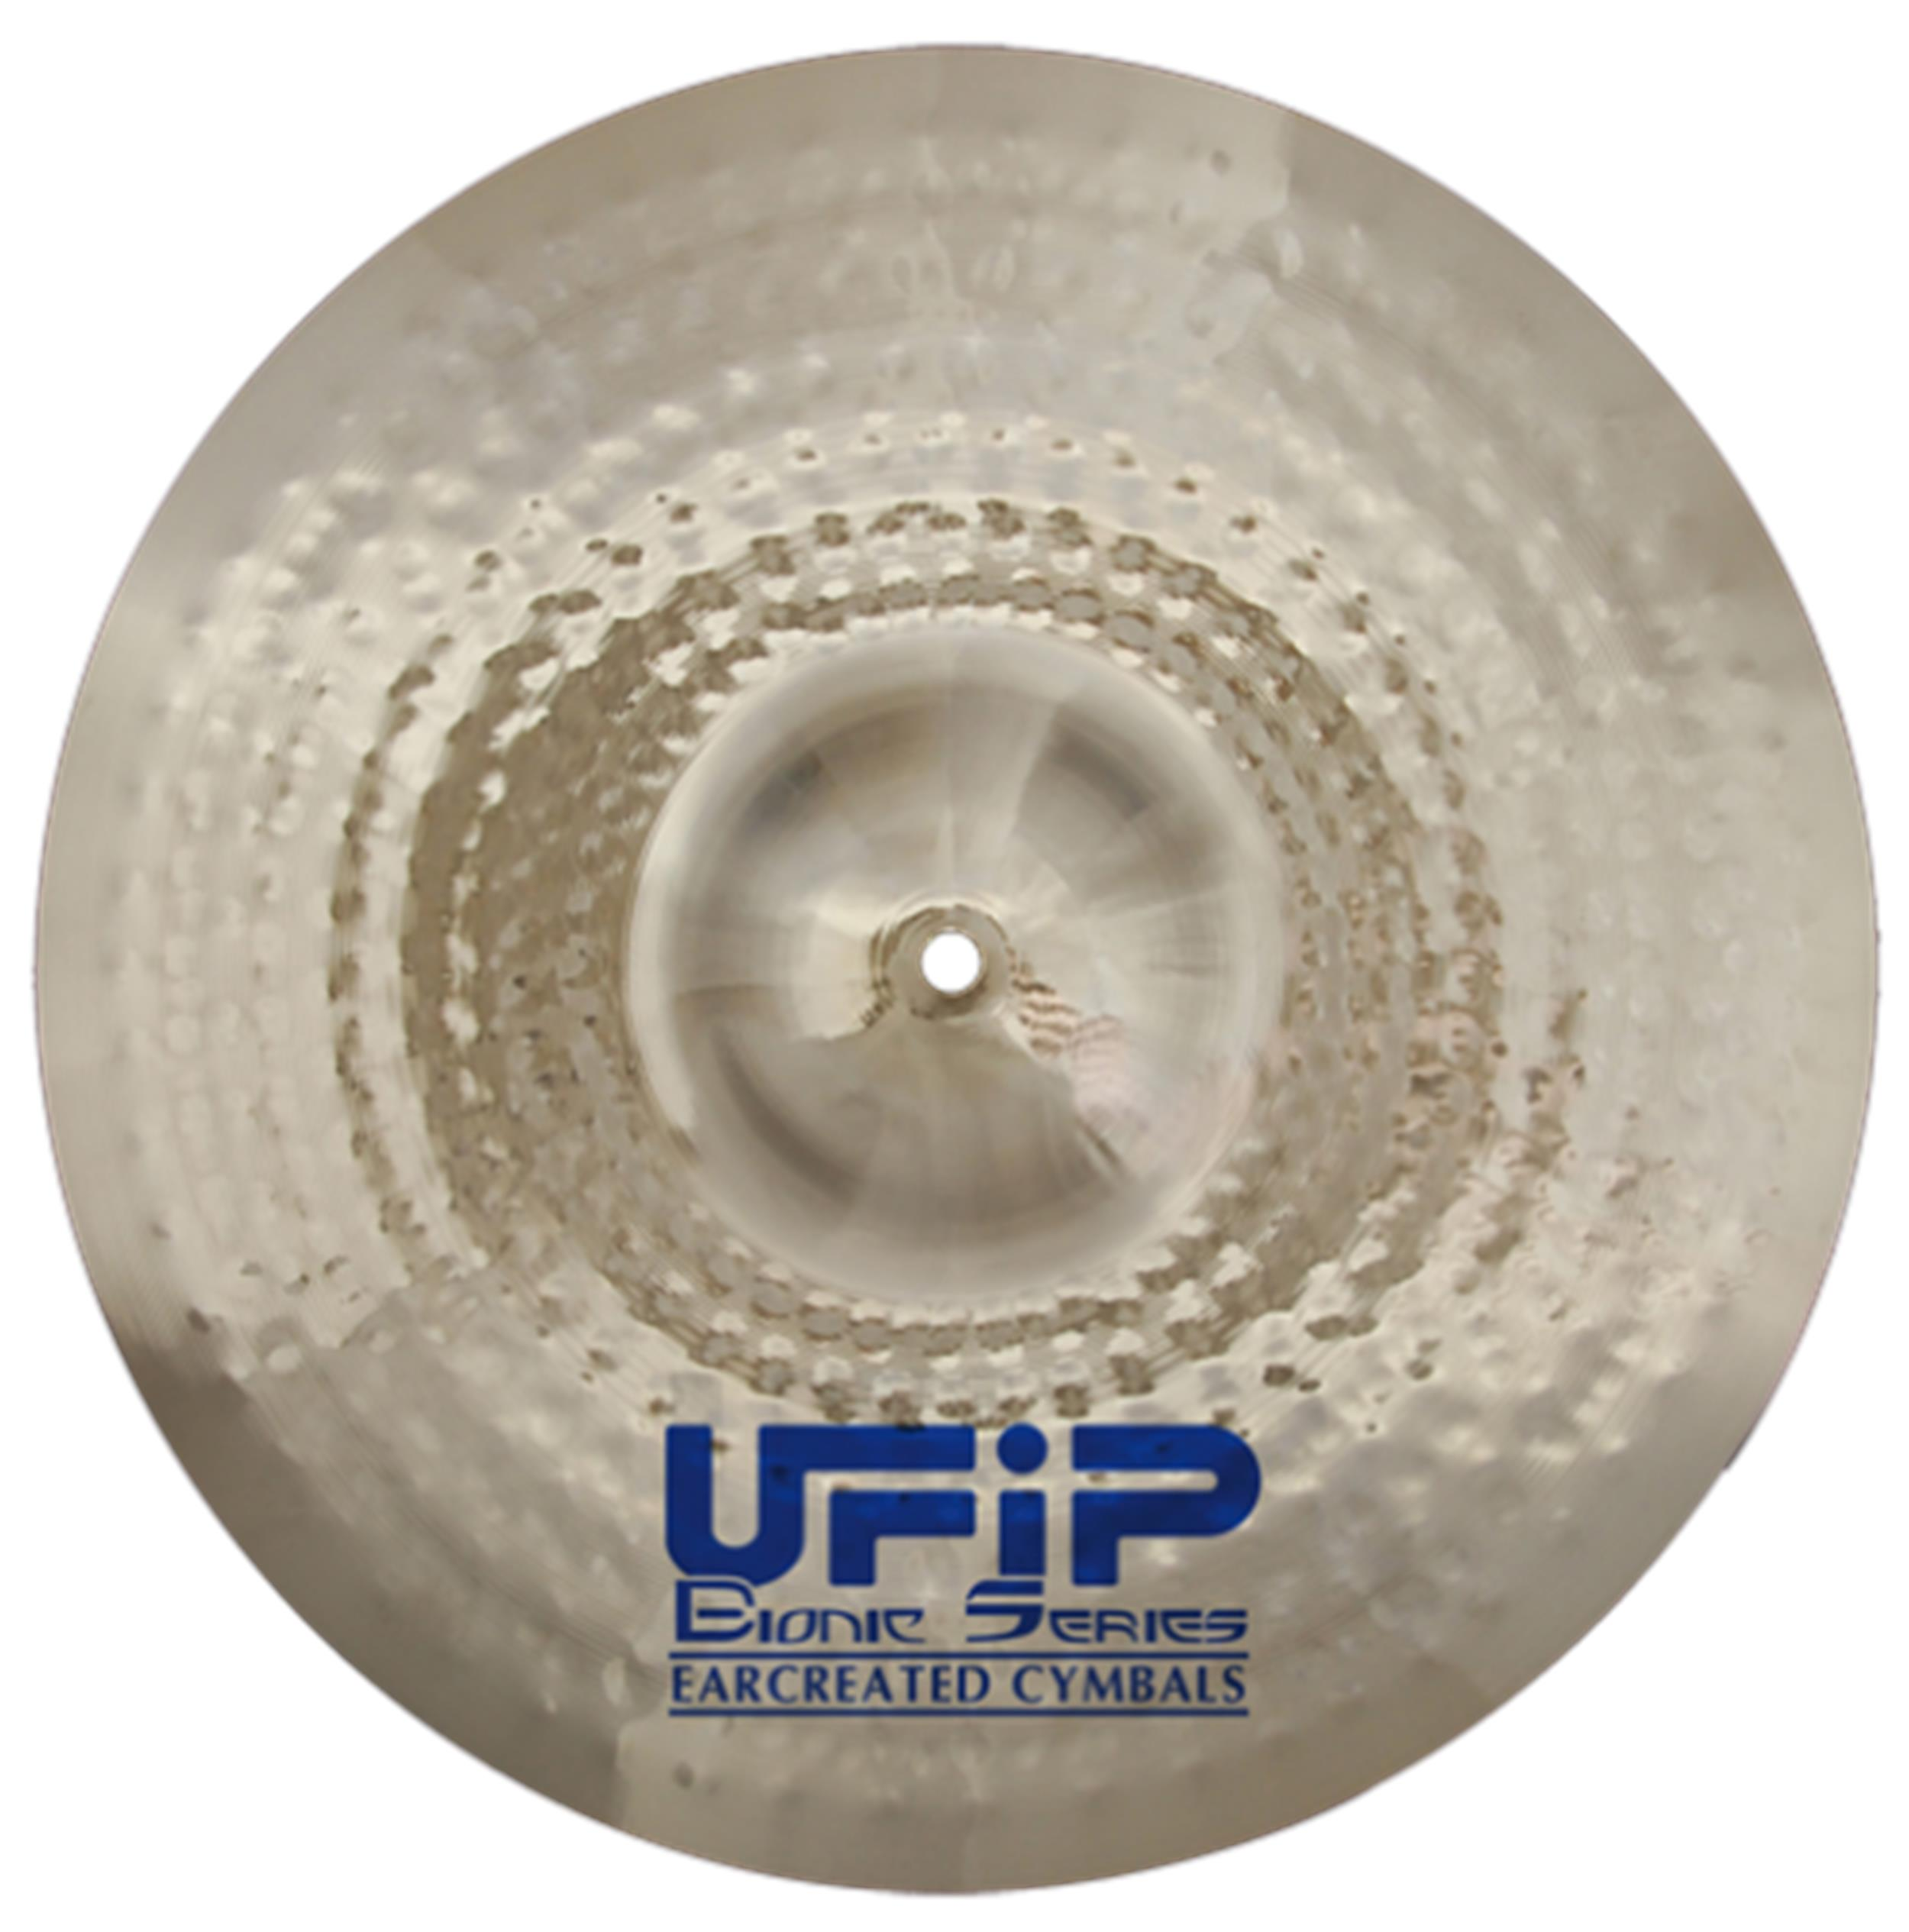 UFIP-BI-19-Bionic-Series-19-Crash-sku-45600008